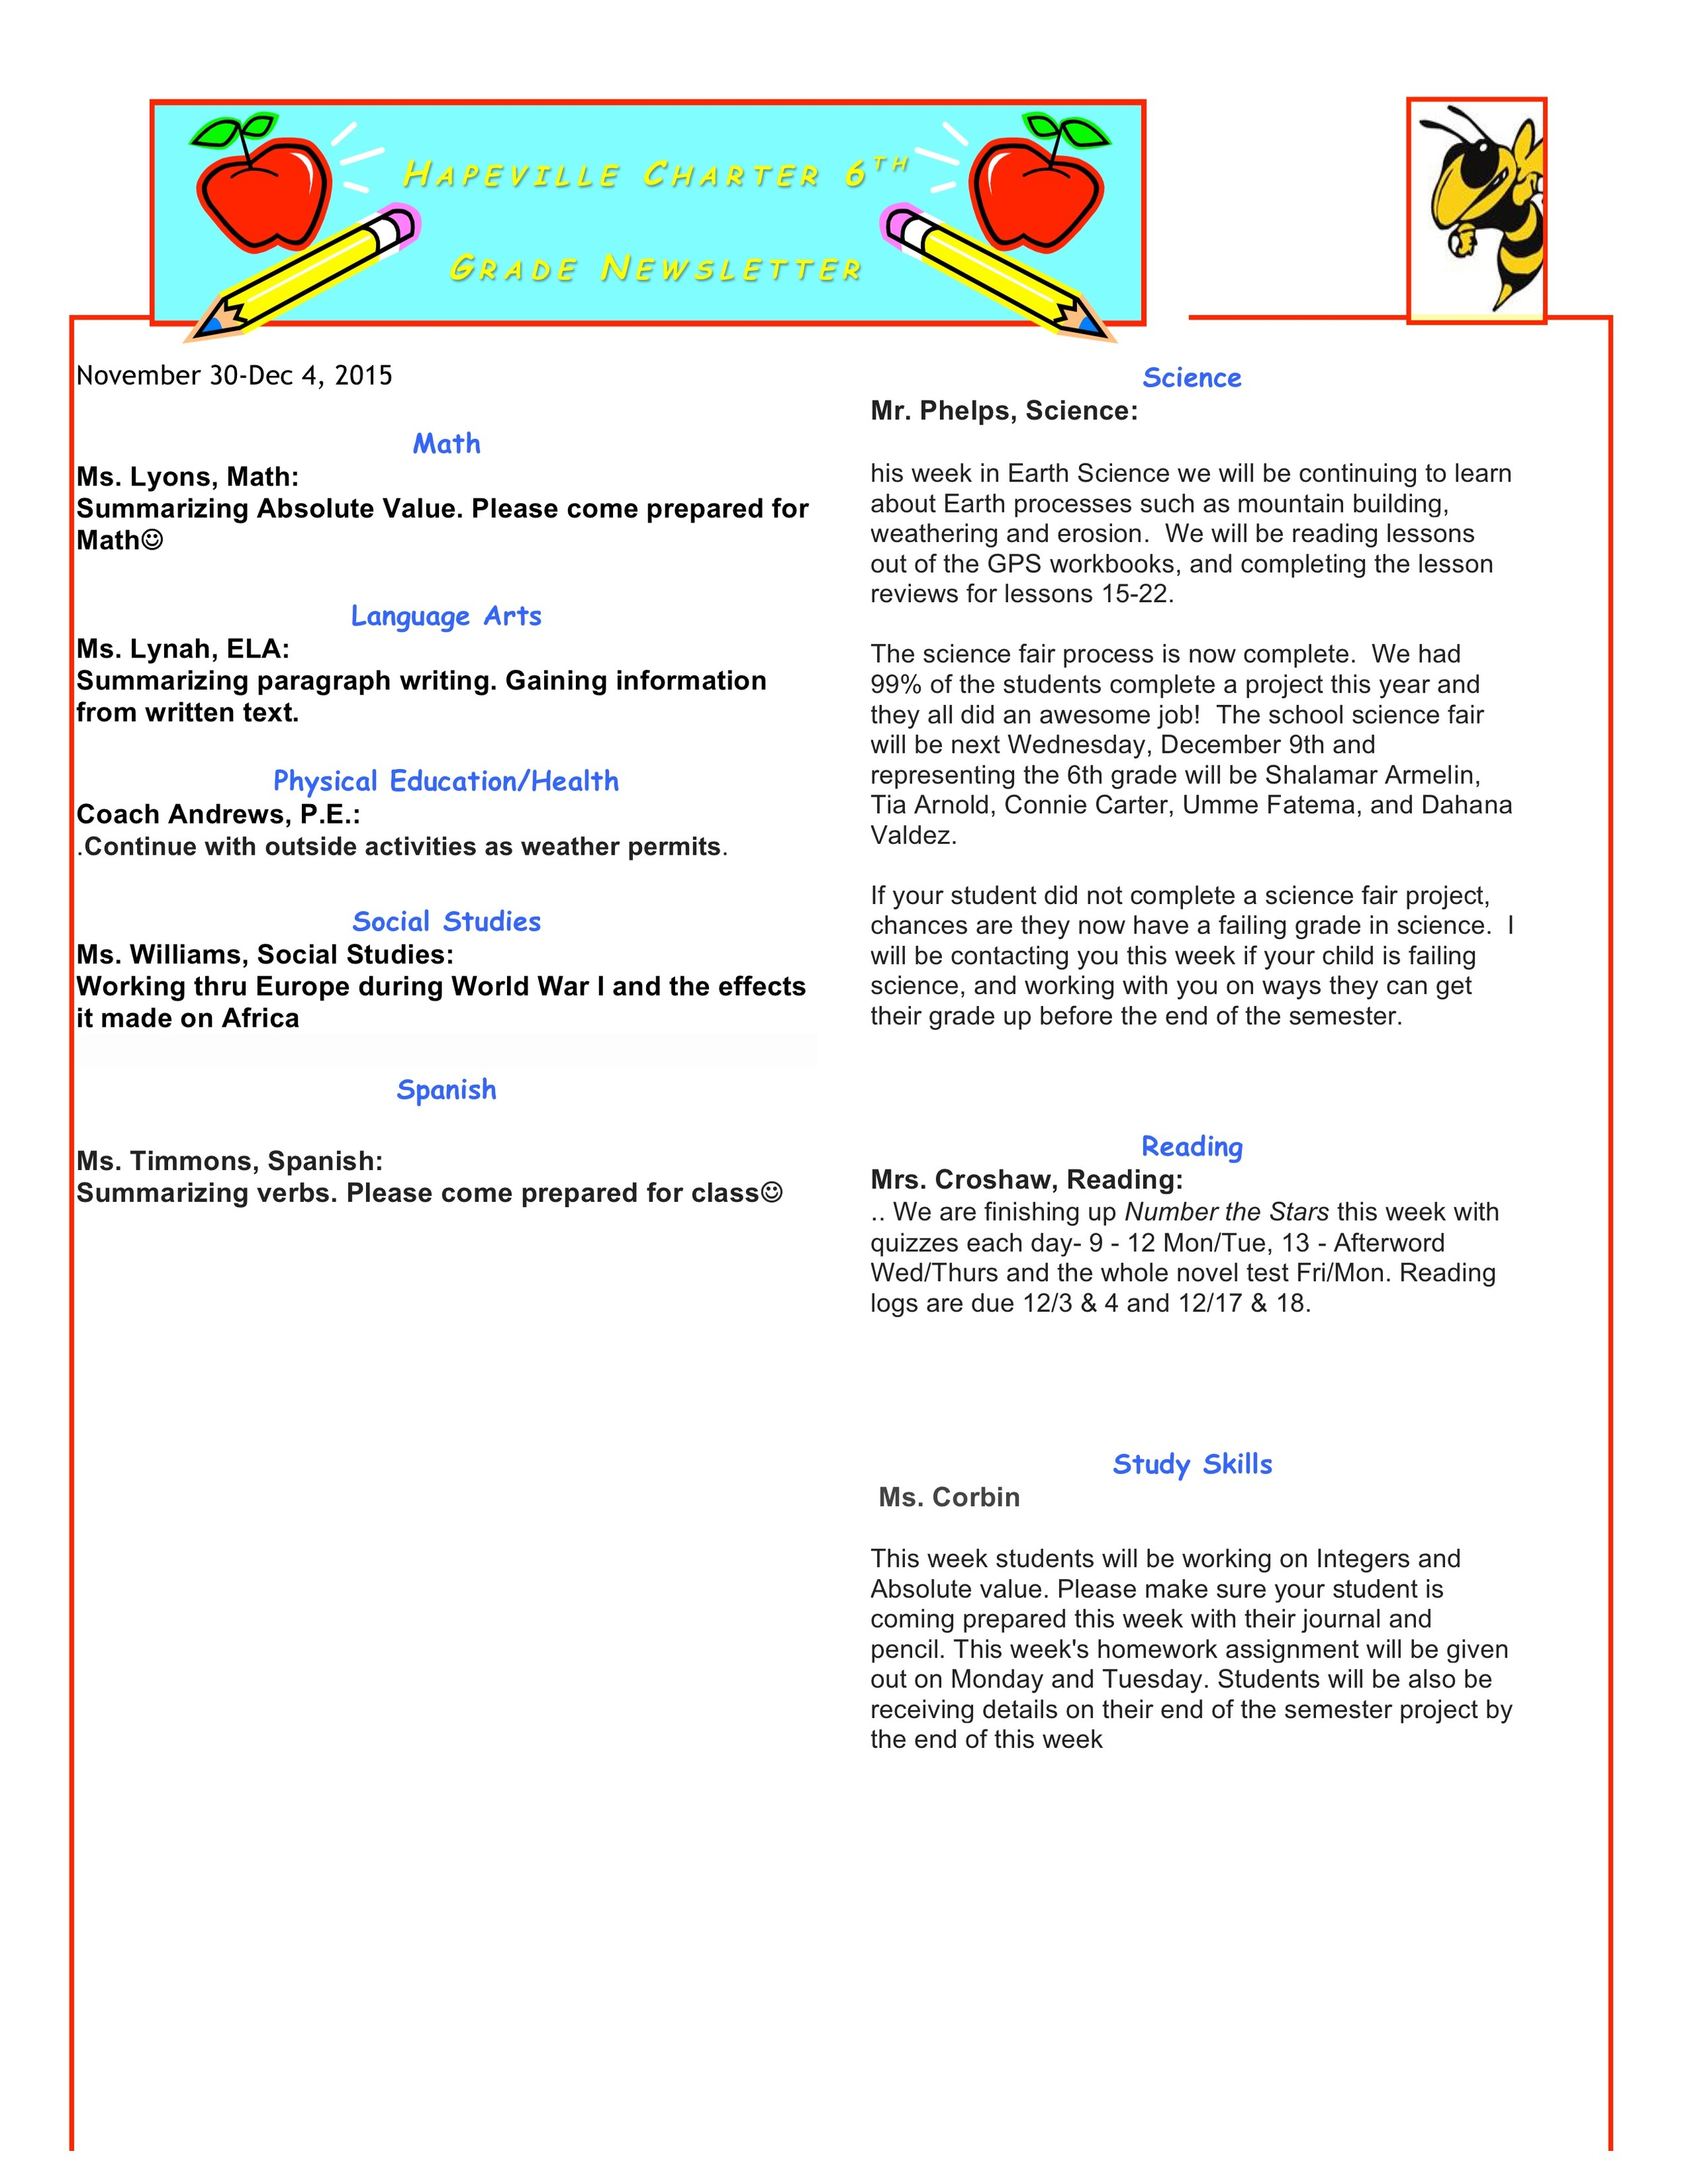 Newsletter Image6th grade dec 1 2015.jpeg